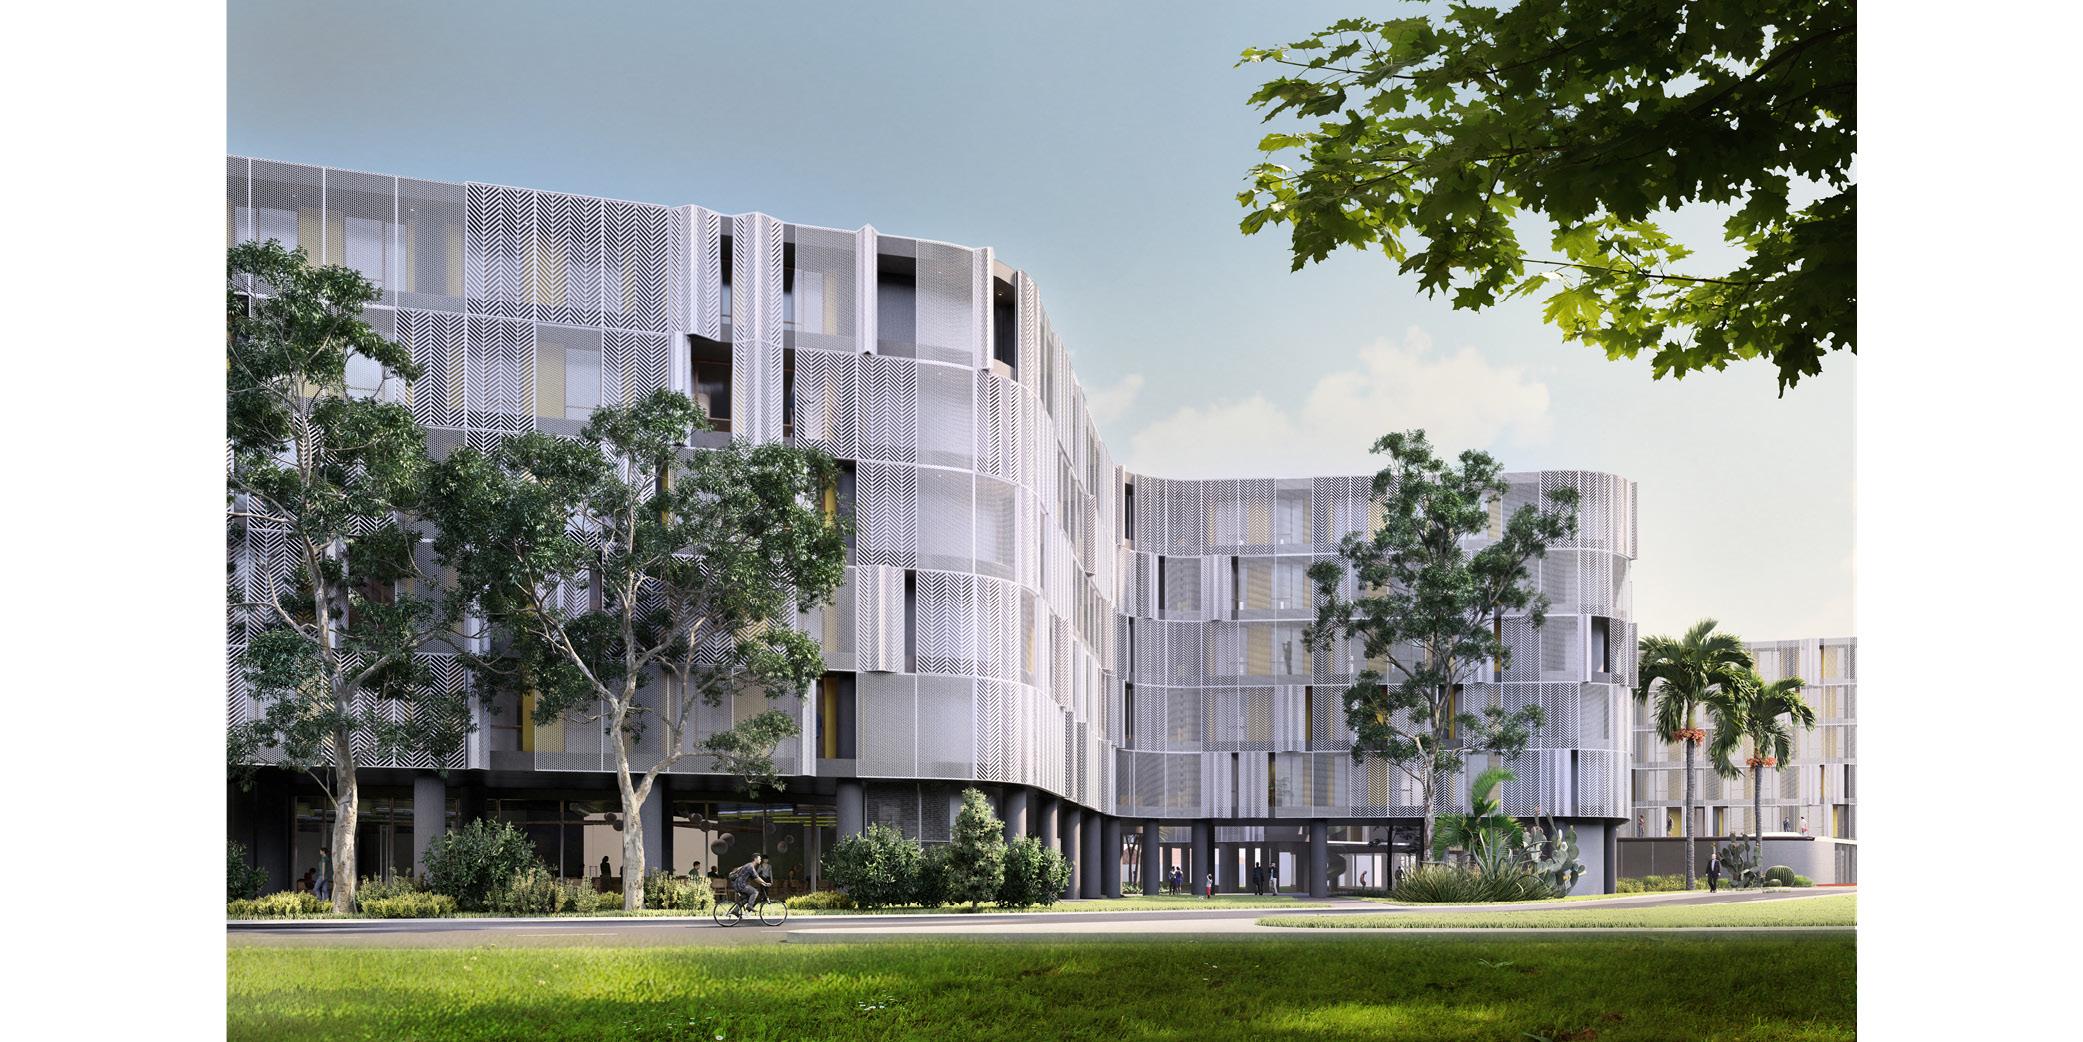 OCA architects Dormitories of the Cyprus University of Technology in Limassol - Κοιτώνες Κύπρος Λεμεσός Hernan Lleida Ruiz Bernardo Garcia Morales